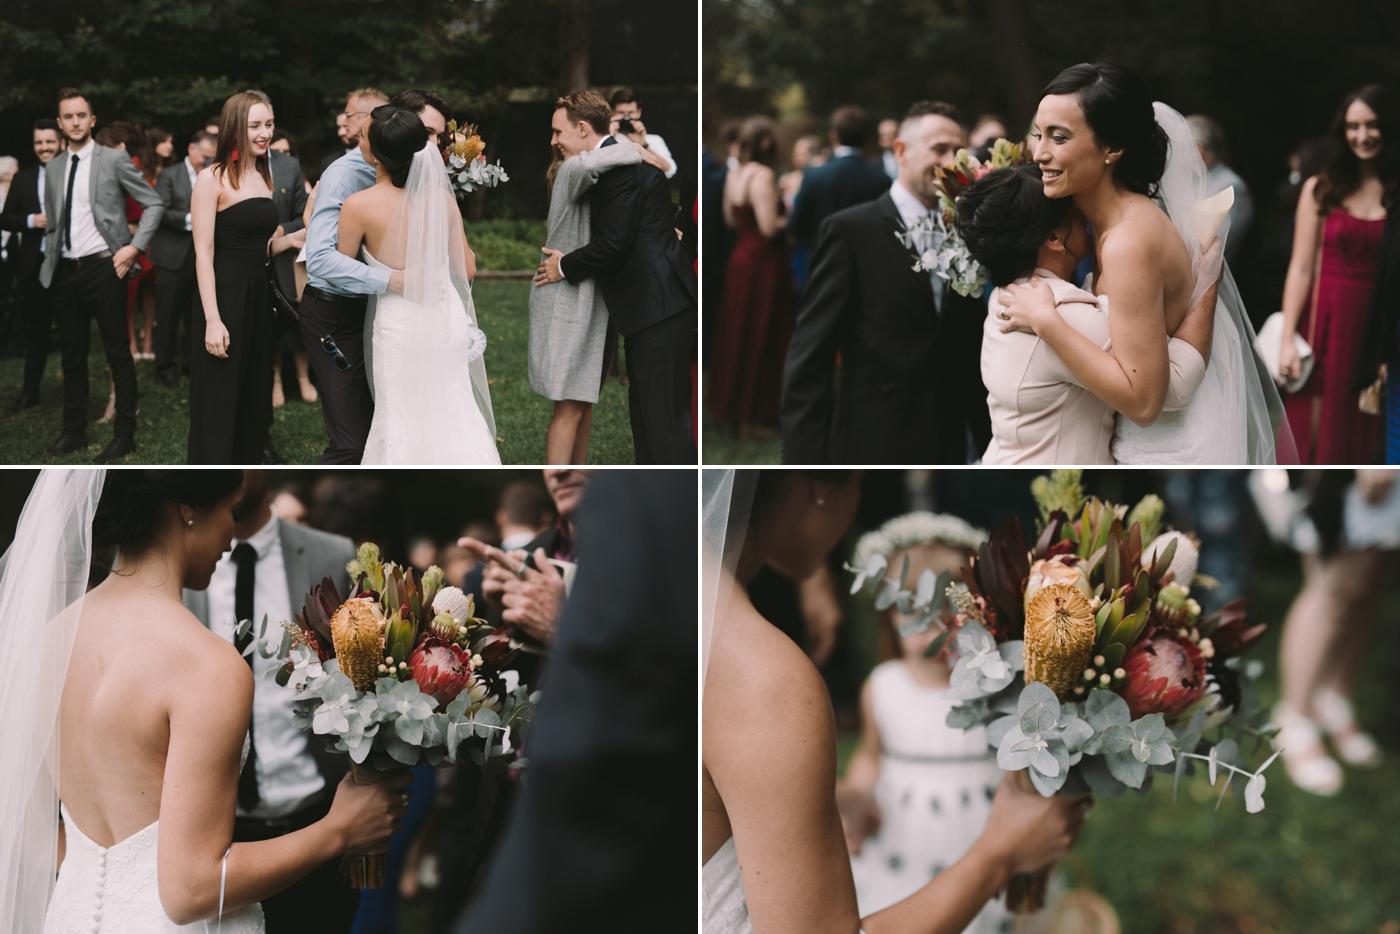 Jasmine and Adam - Natural wedding photographer in Adelaide - Candid Wedding Photographer Adelaide - www.katherineschultzphotography.com 31